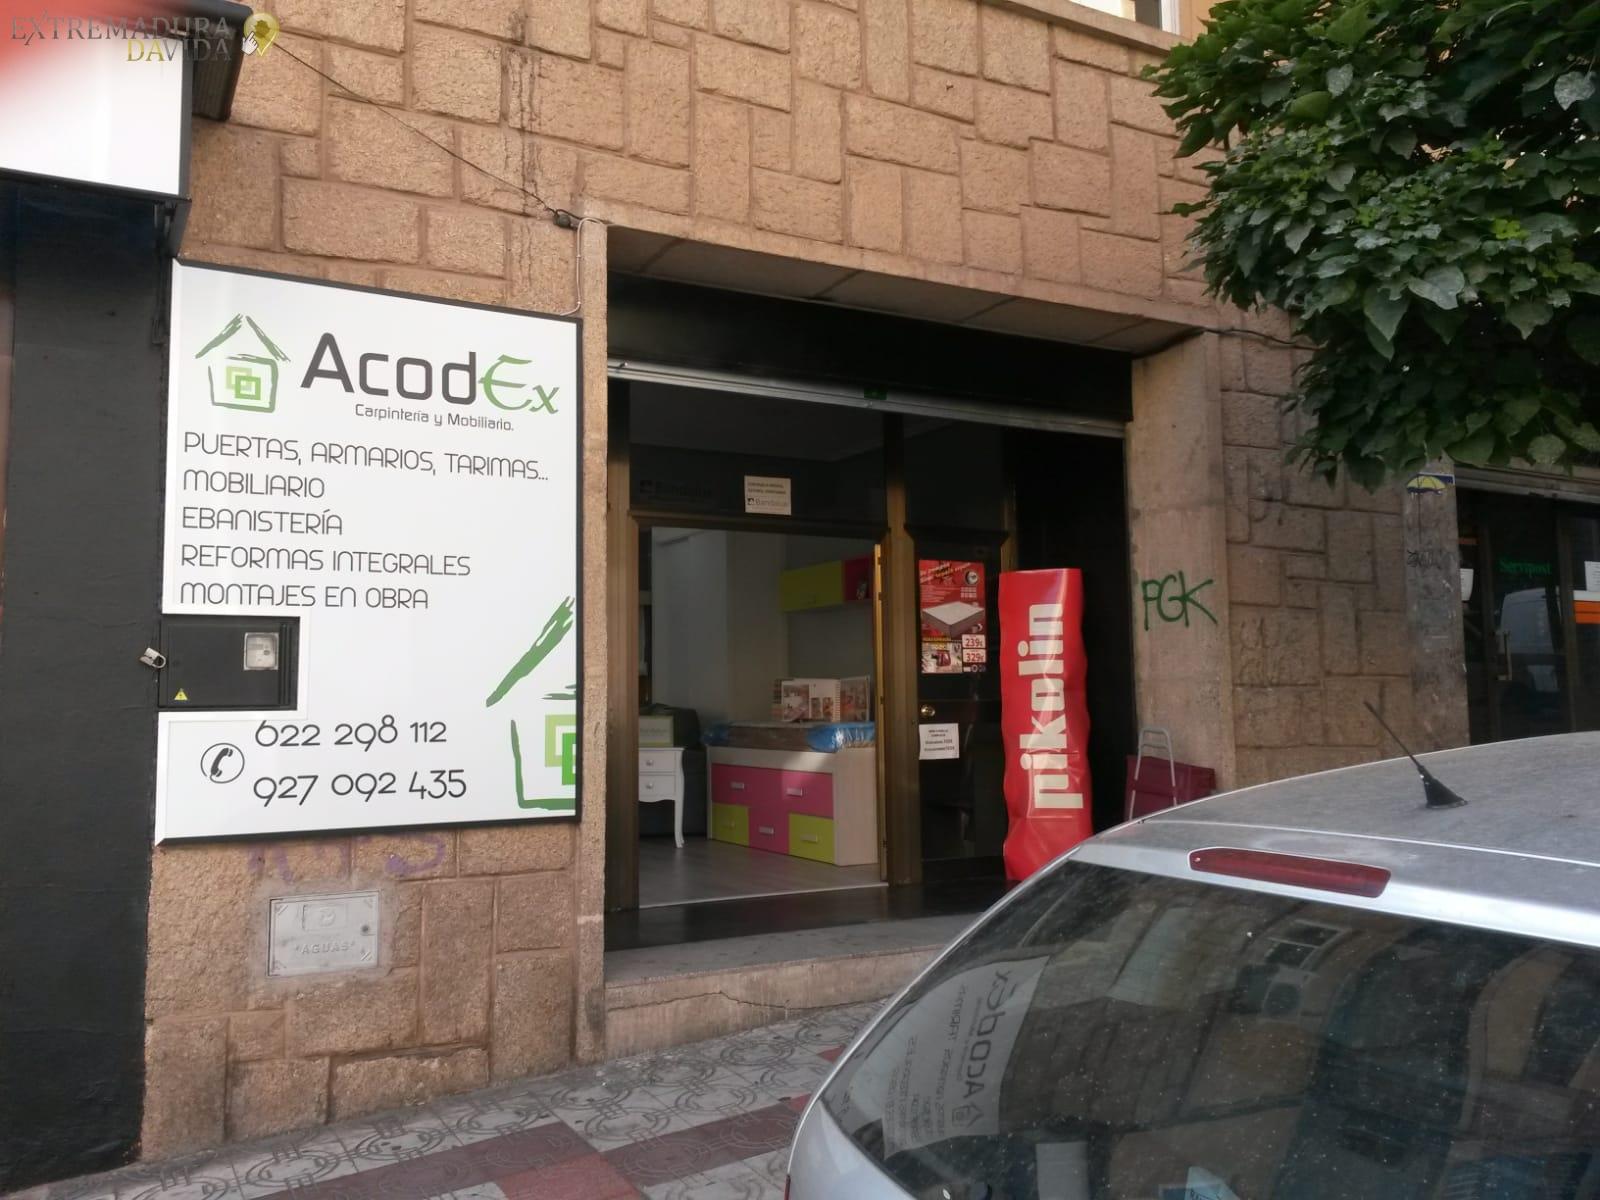 Tienda de Hogar en Cáceres Acodex